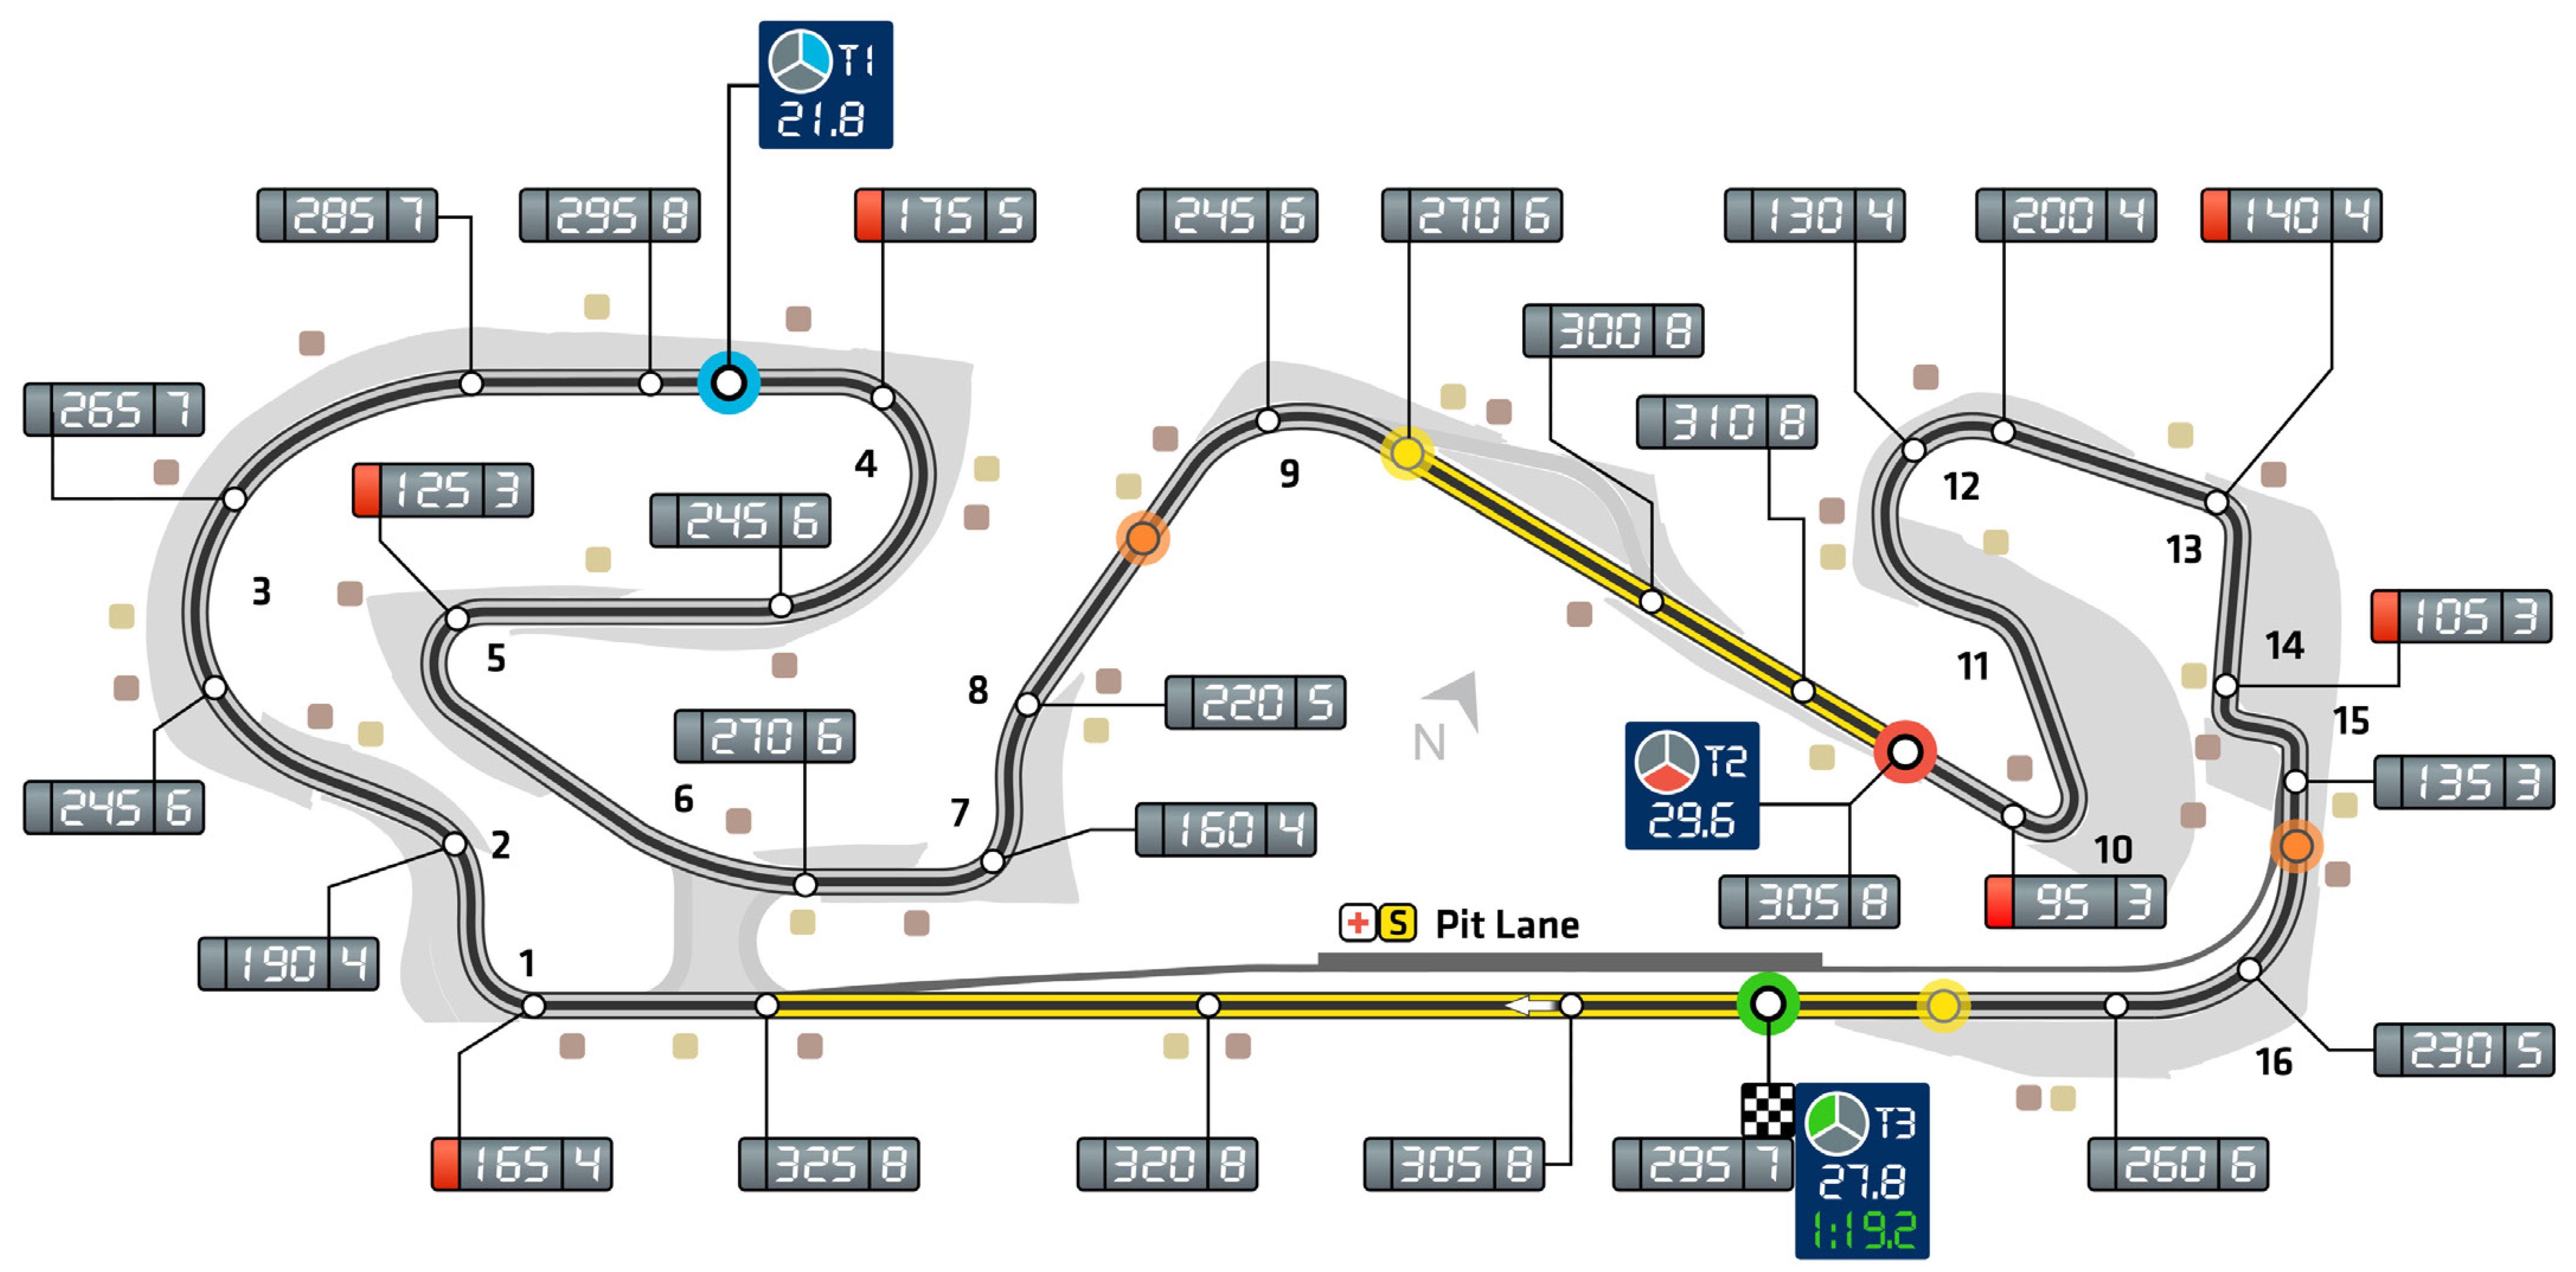 Catalunya circuit records and layout